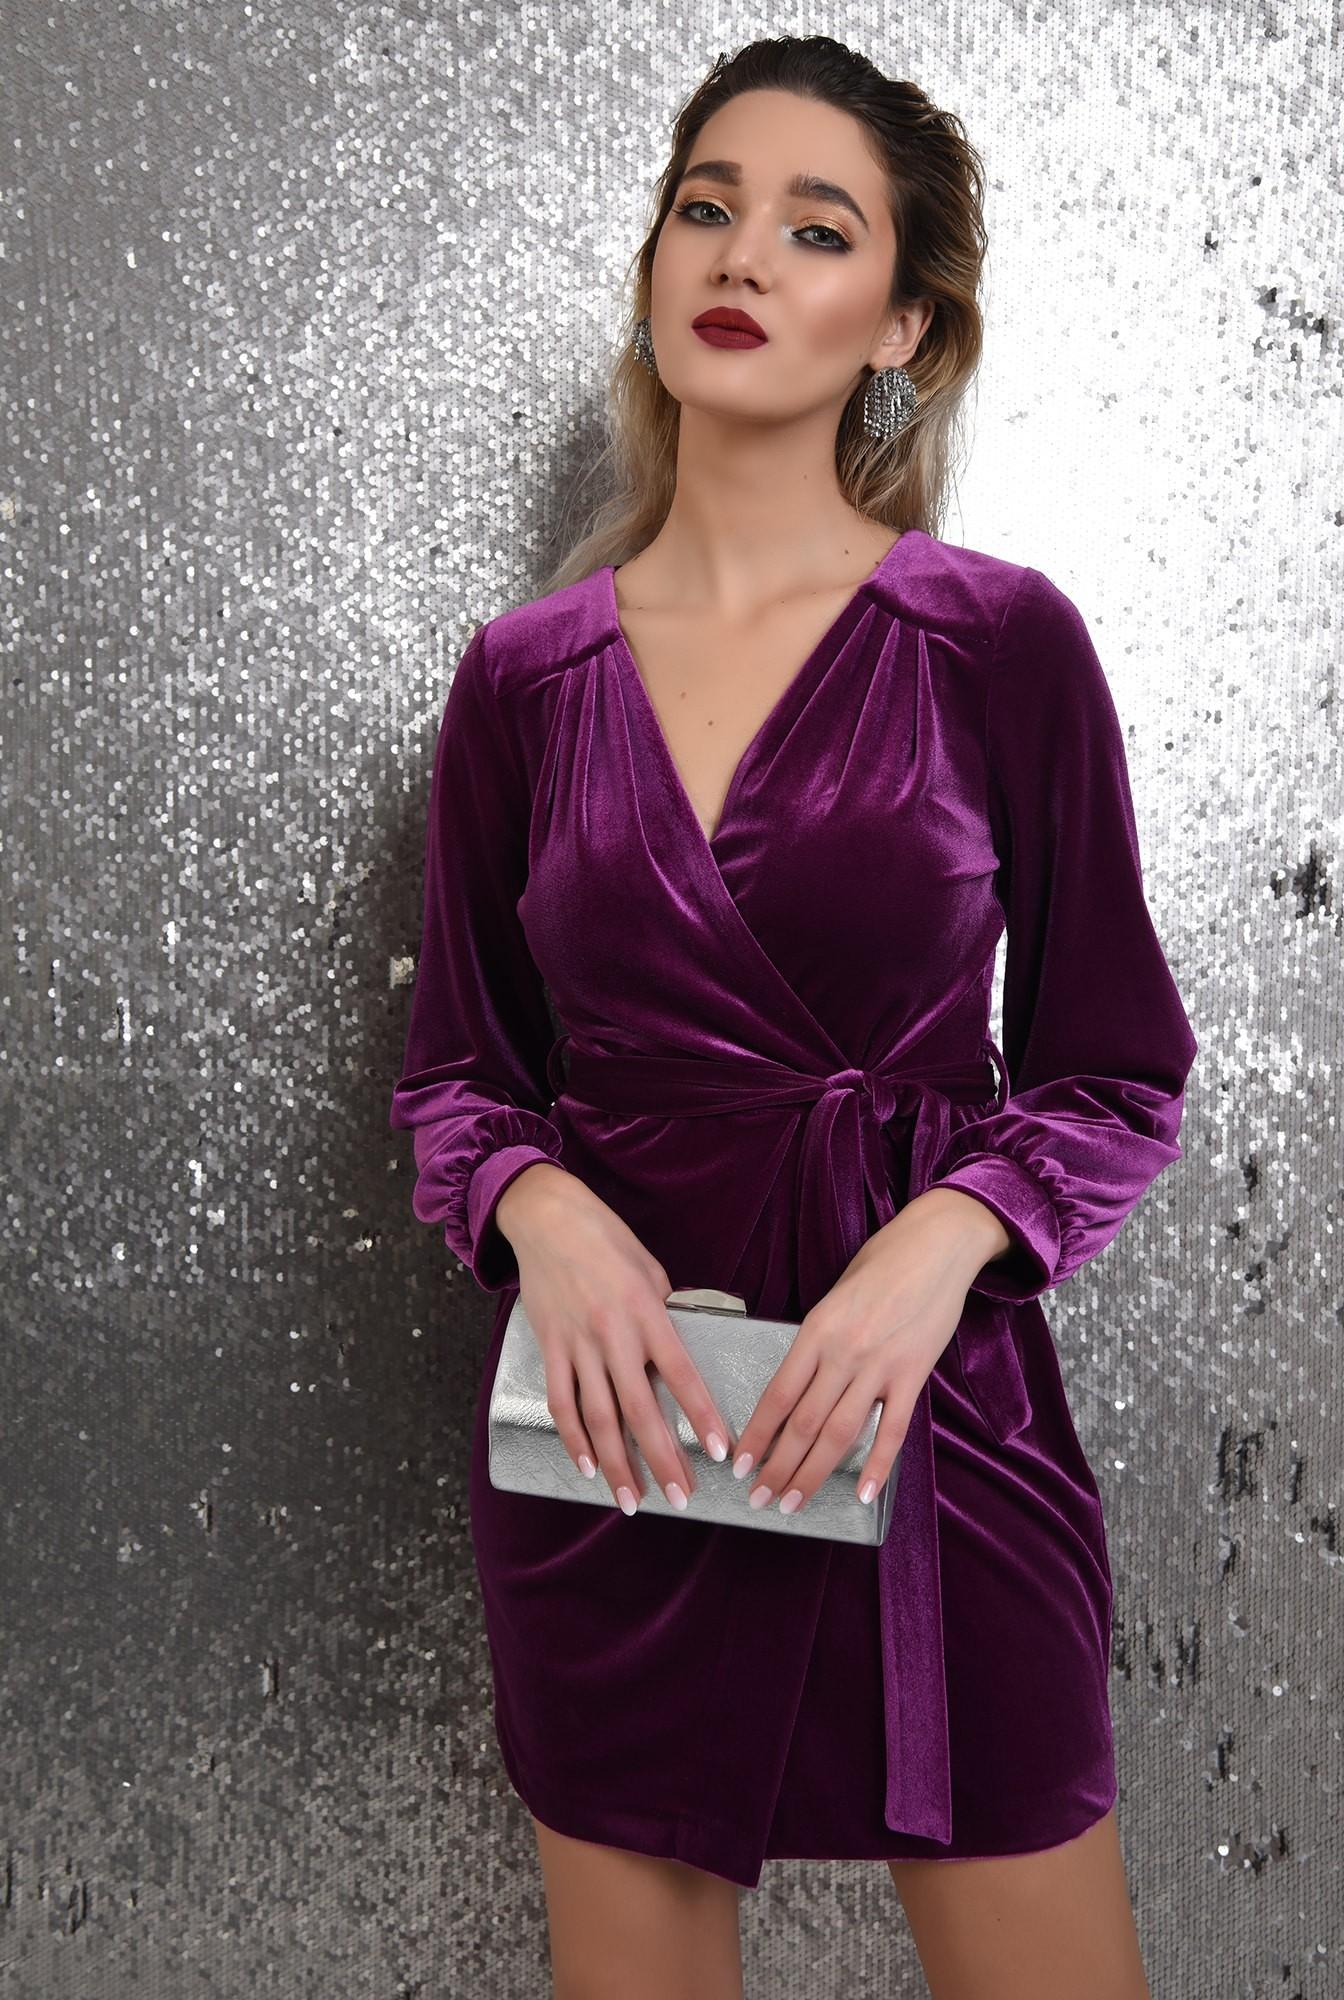 0 - rochie din catifea, mov, cordon, rochie eleganta, Poema